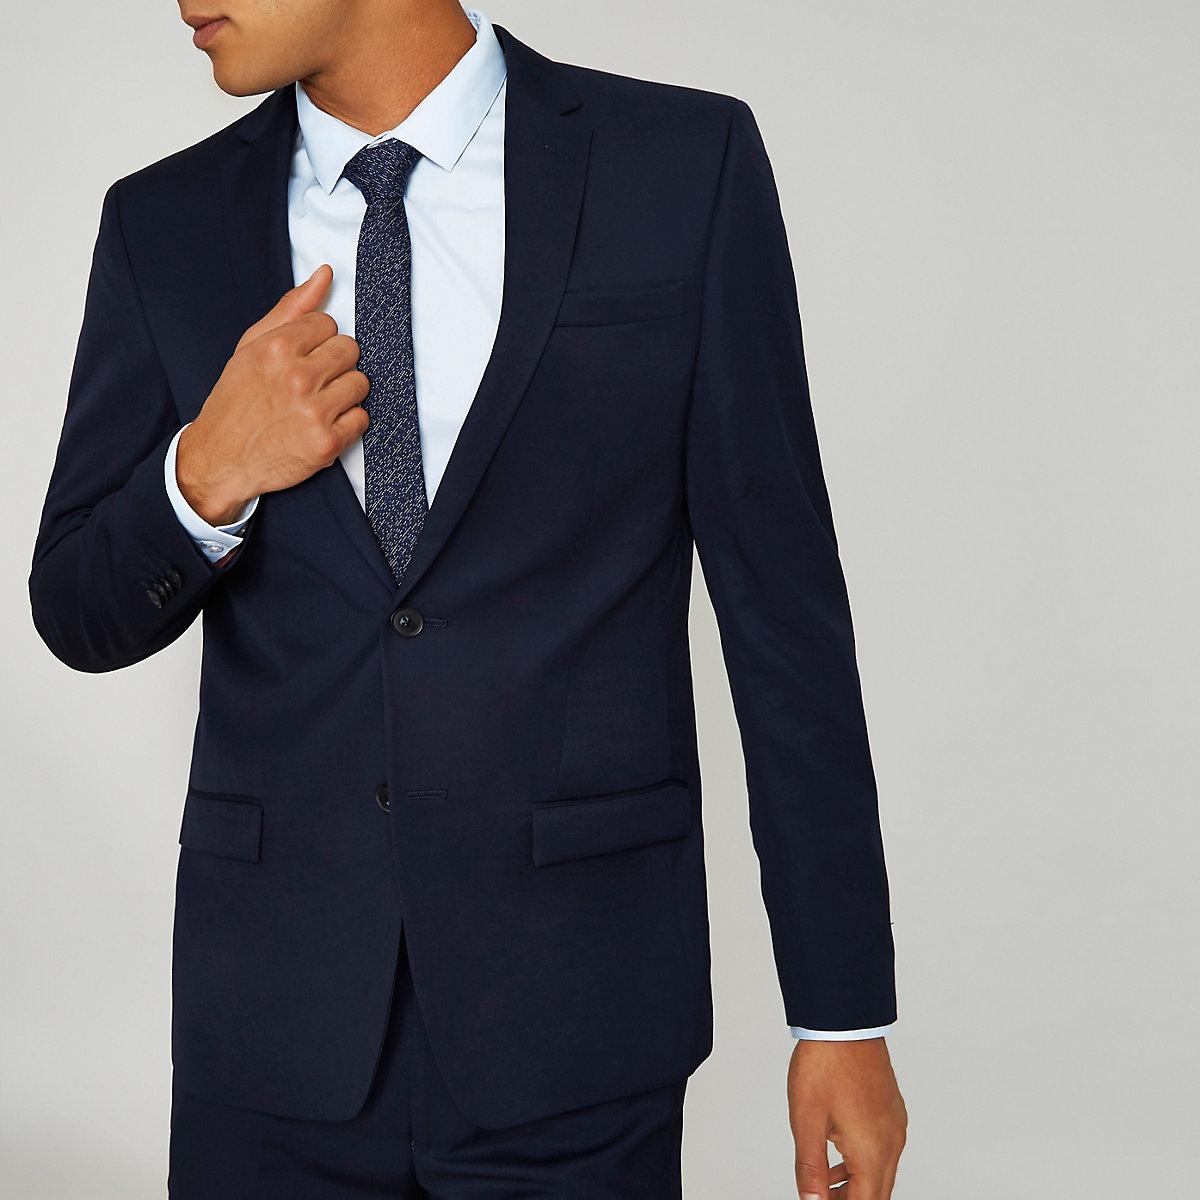 Navy slim fit suit jacket